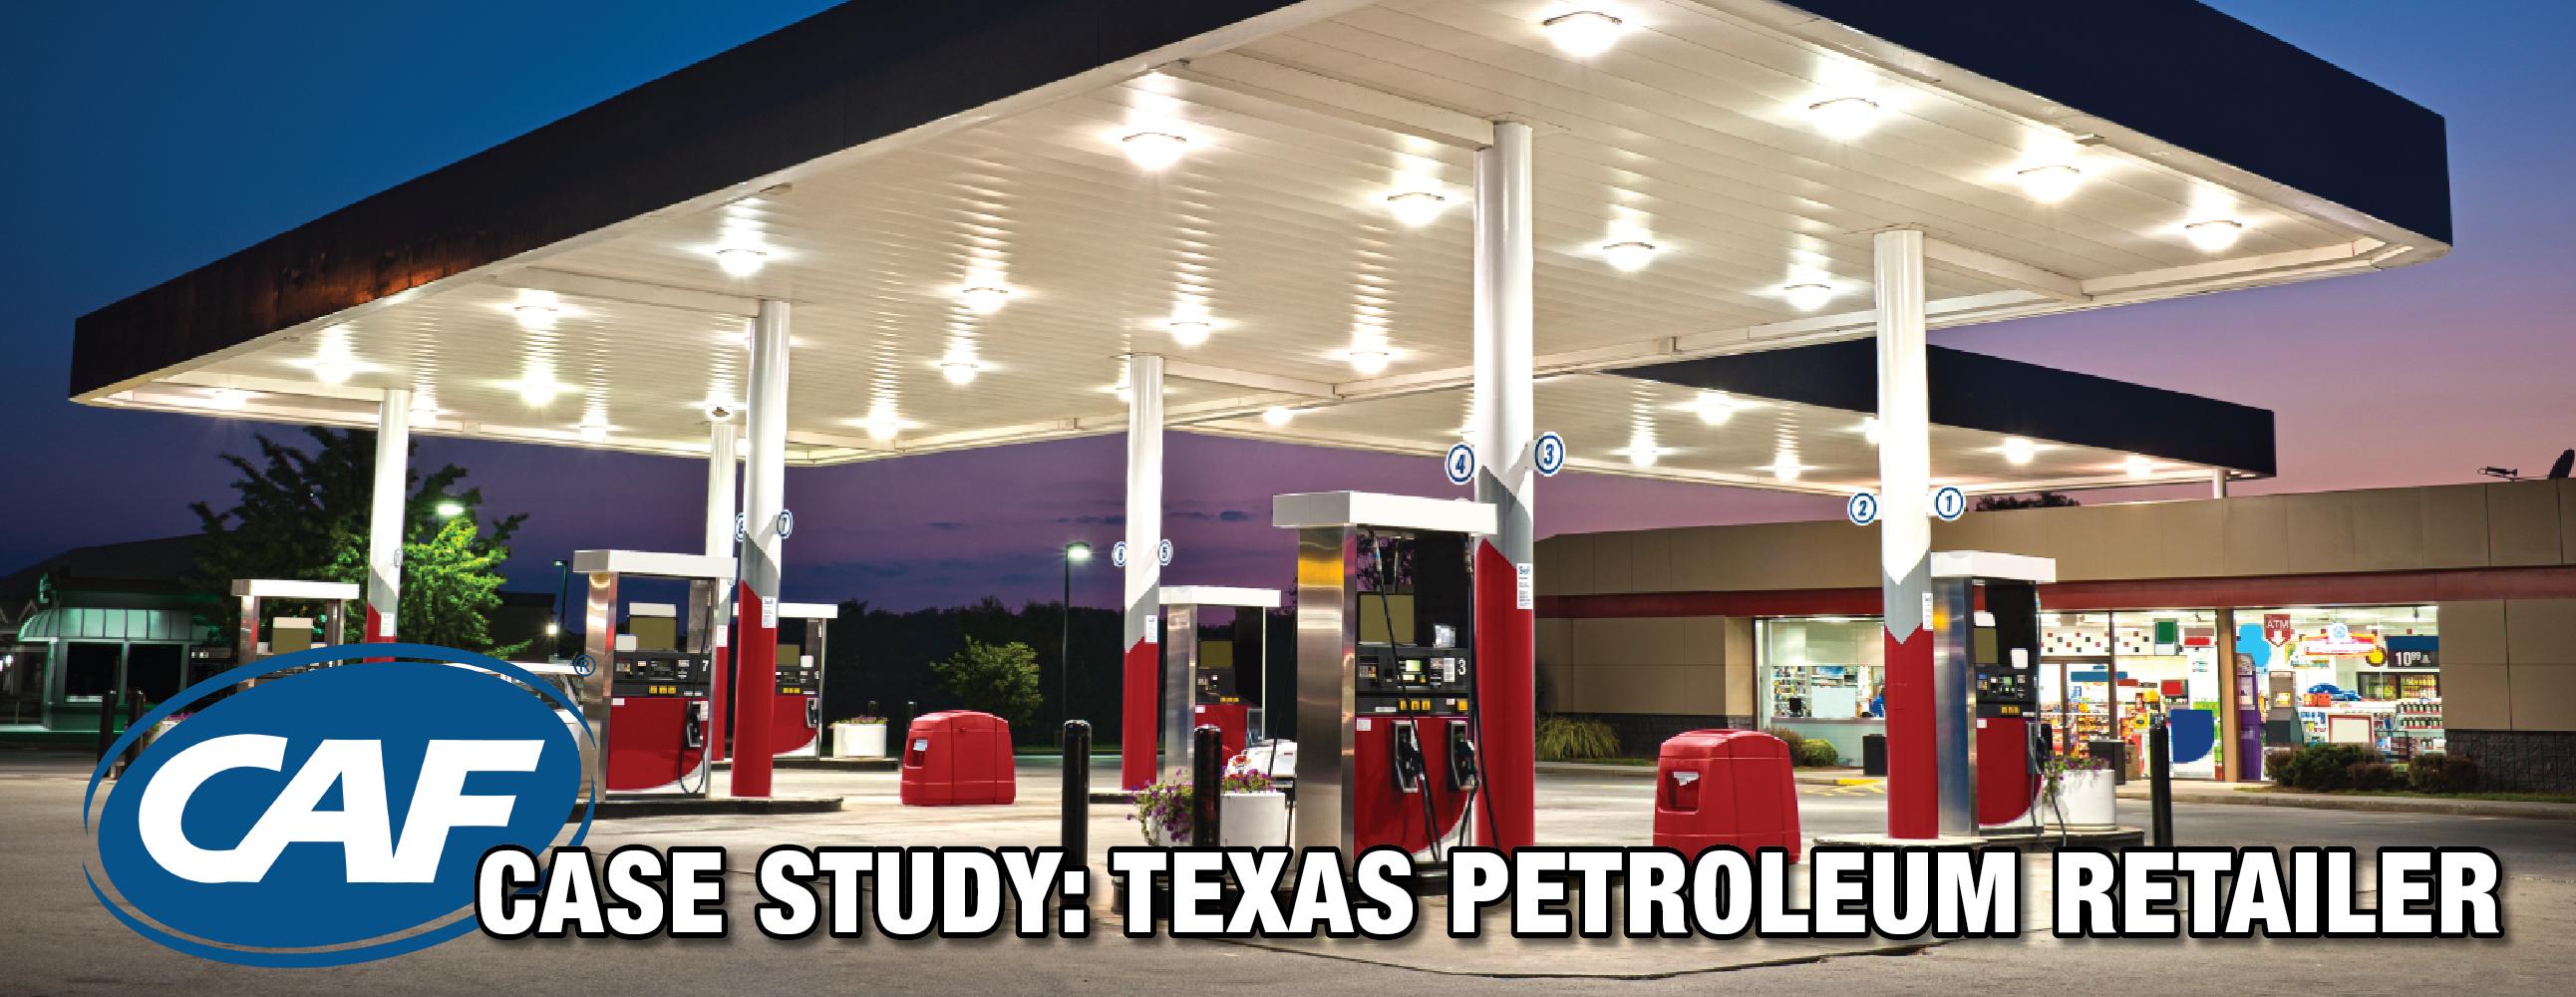 Case Study: Texas Petroleum Retailer